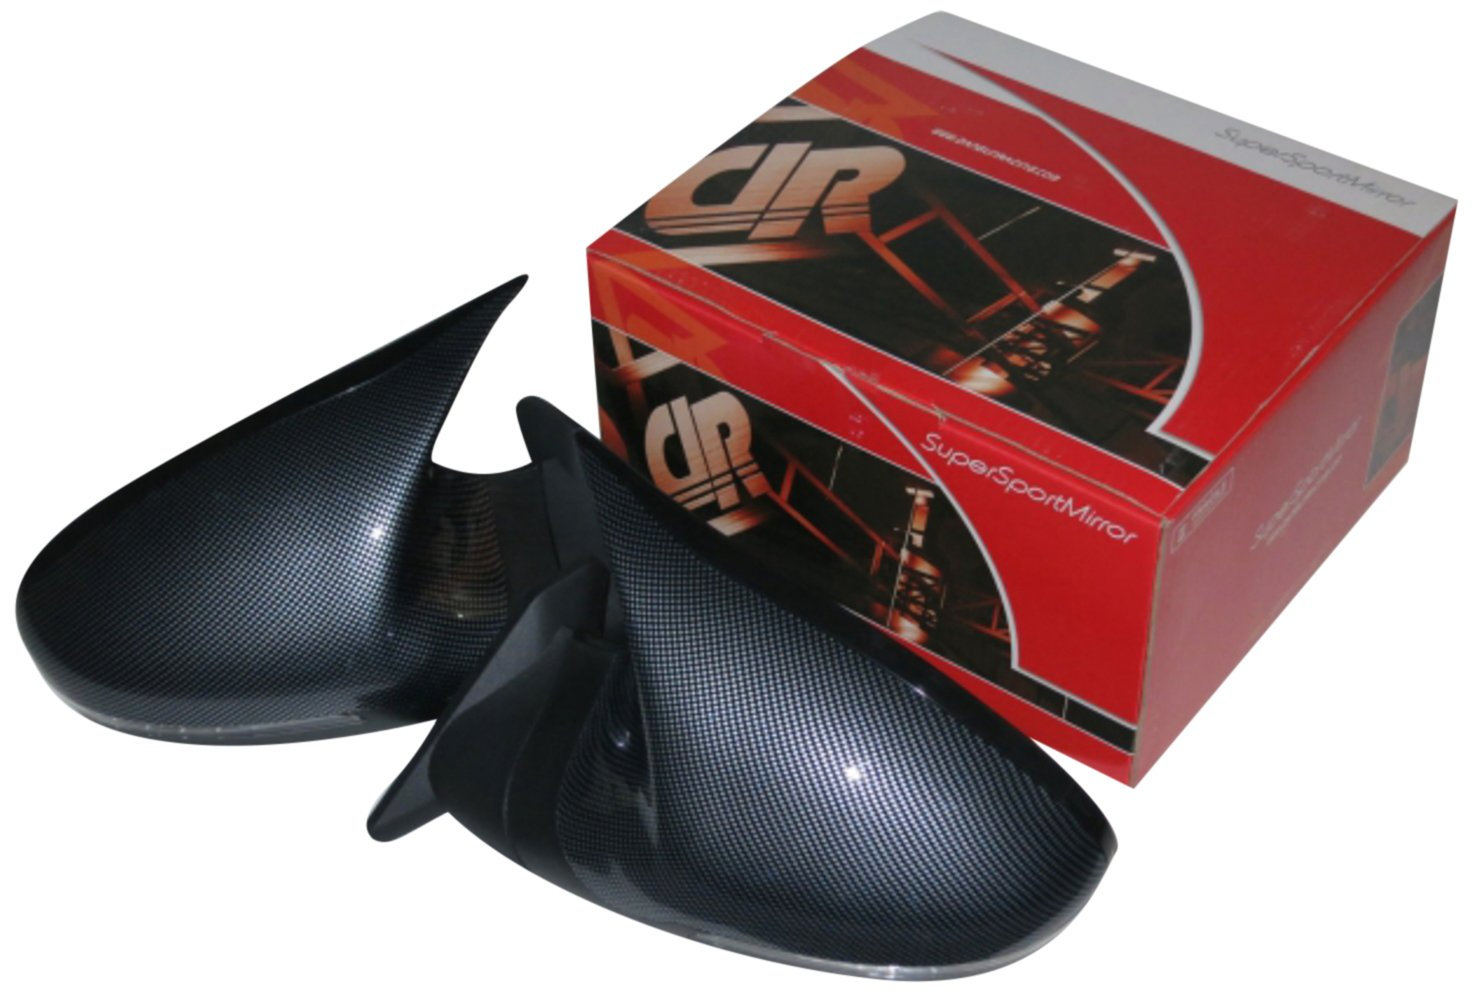 GTSミラー LED カーボンルック 電動格納 ミラー面電動調整 右ハンドル フォルクスワーゲン ルポ 6X系 [2001~2006] SBMGTSCBALHR-0211 B075S8KX94 フォルクスワーゲン ルポ 6X系 [2001~2006]|カーボンルック カーボンルック フォルクスワーゲン ルポ 6X系 [2001~2006]